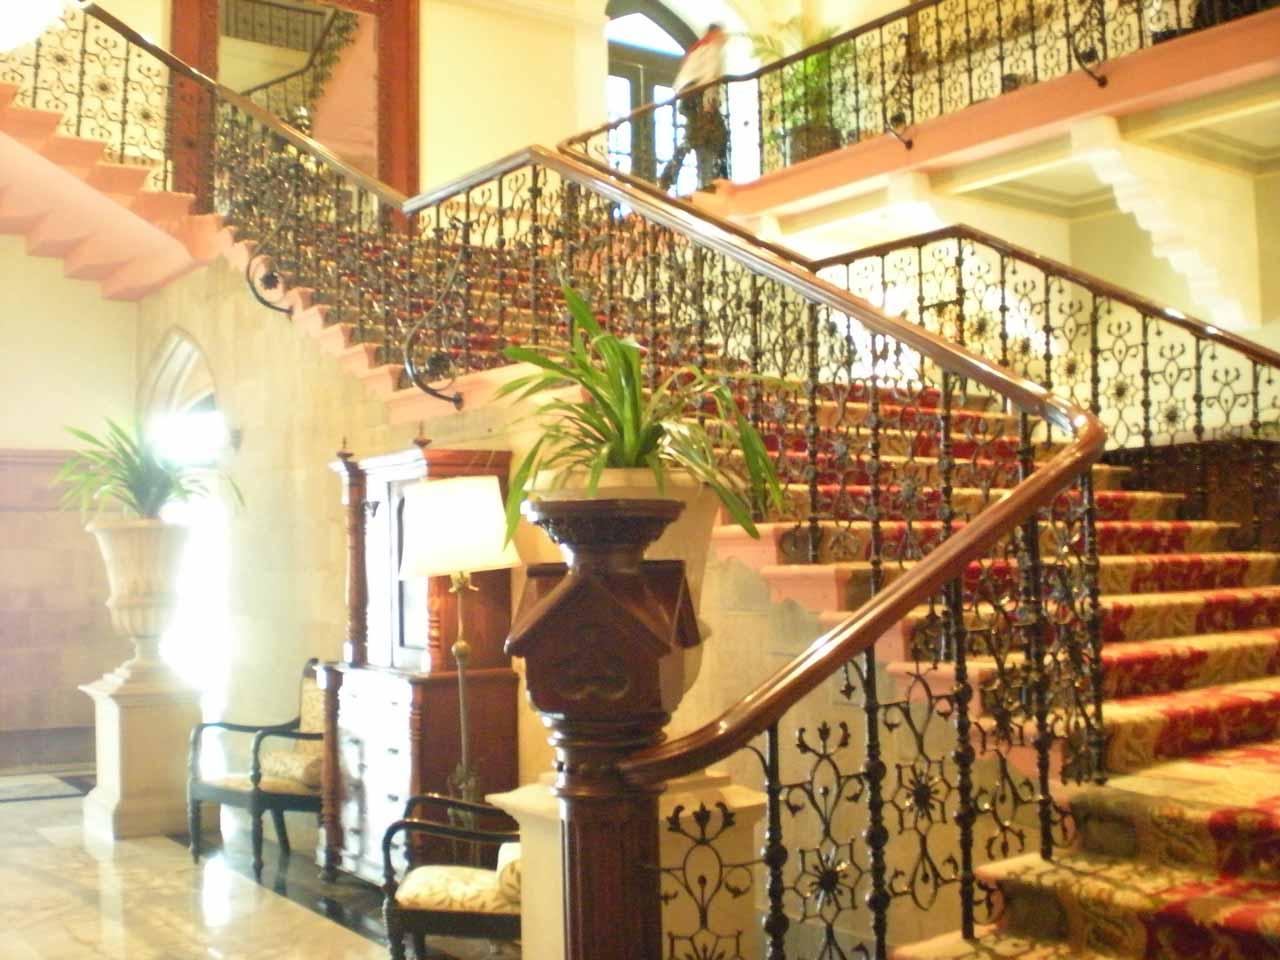 Inside the Taj Mahal Hotel